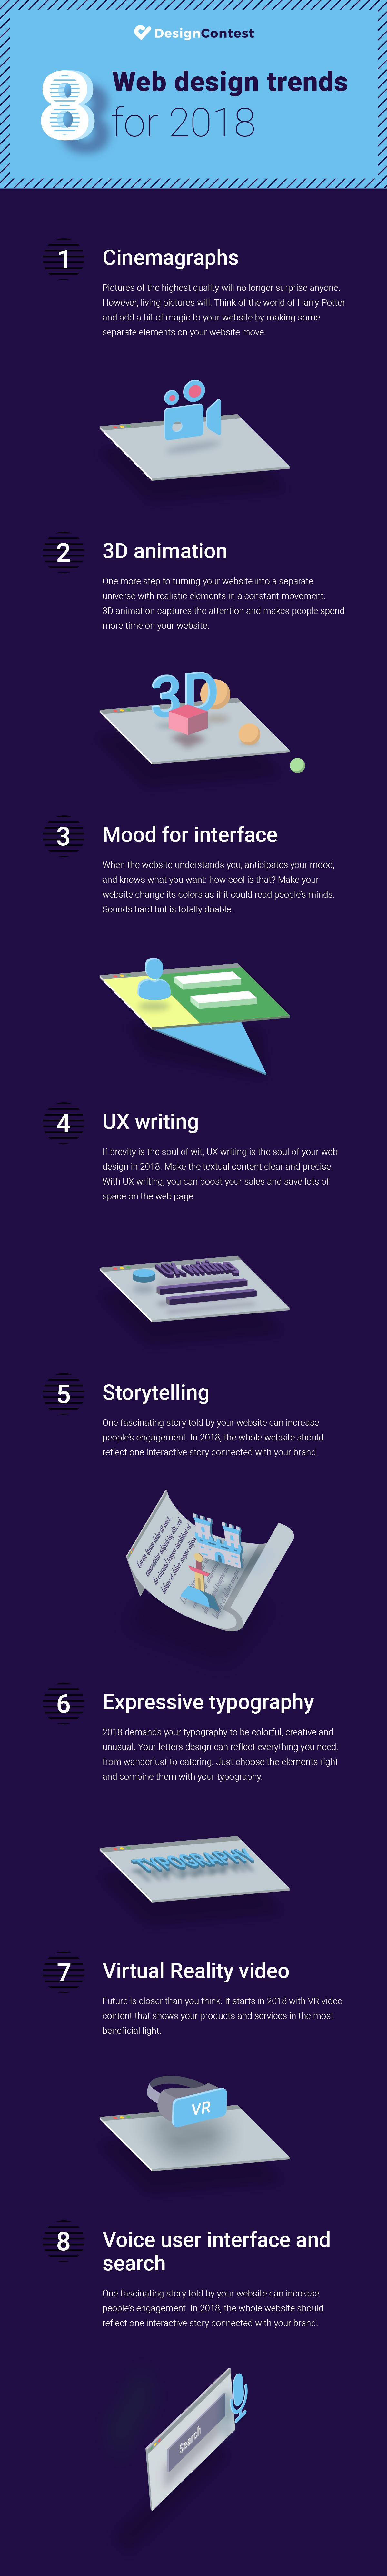 DesignContest 2018 Web Design Trends Infographic